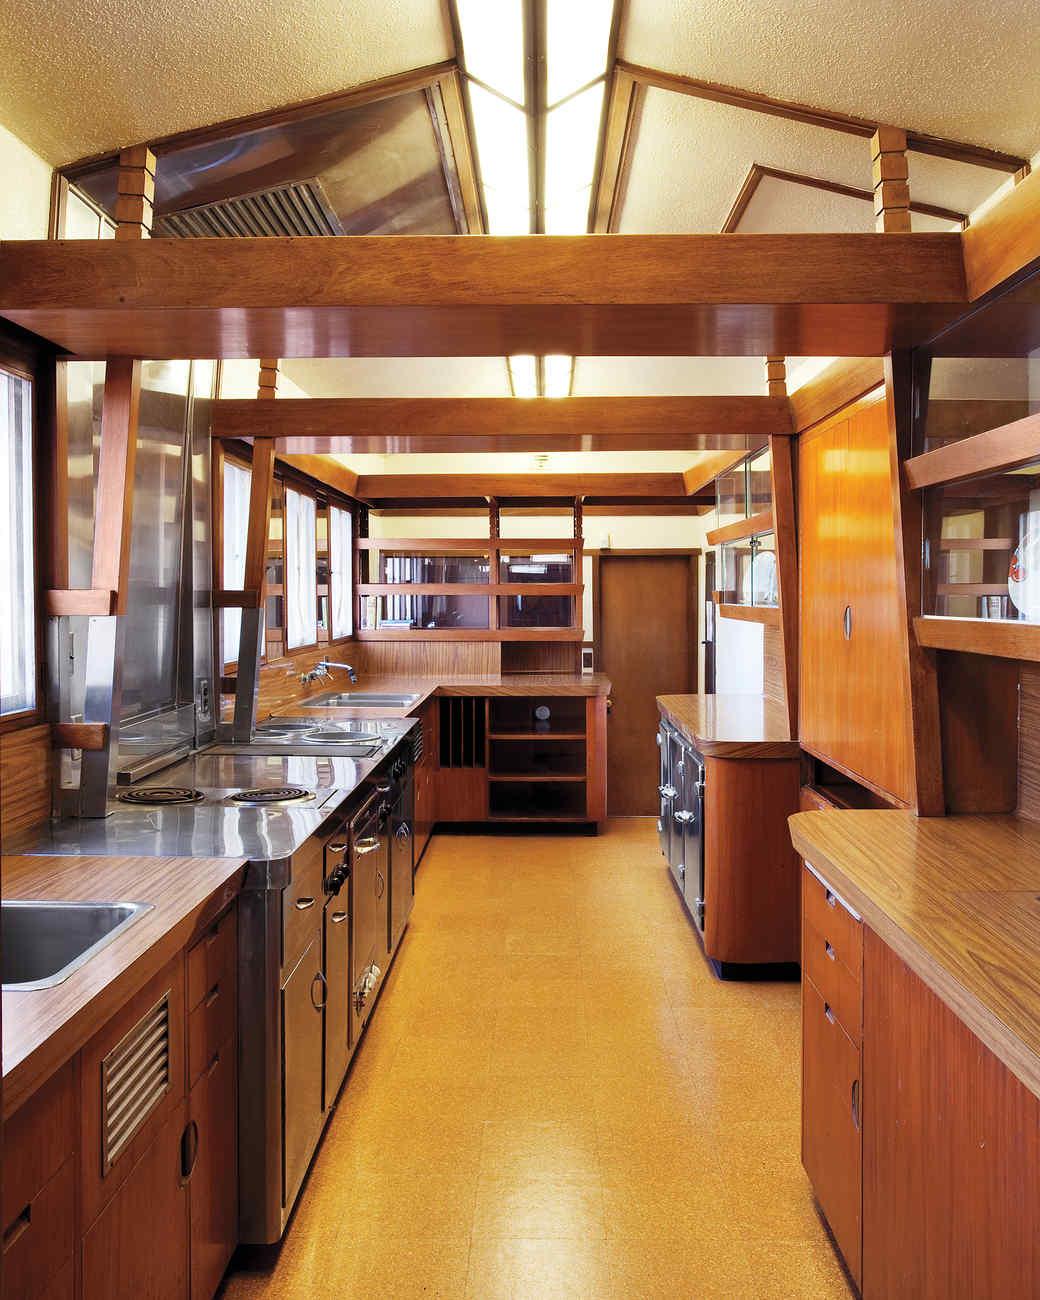 american treasure hollyhock house martha stewart. Black Bedroom Furniture Sets. Home Design Ideas